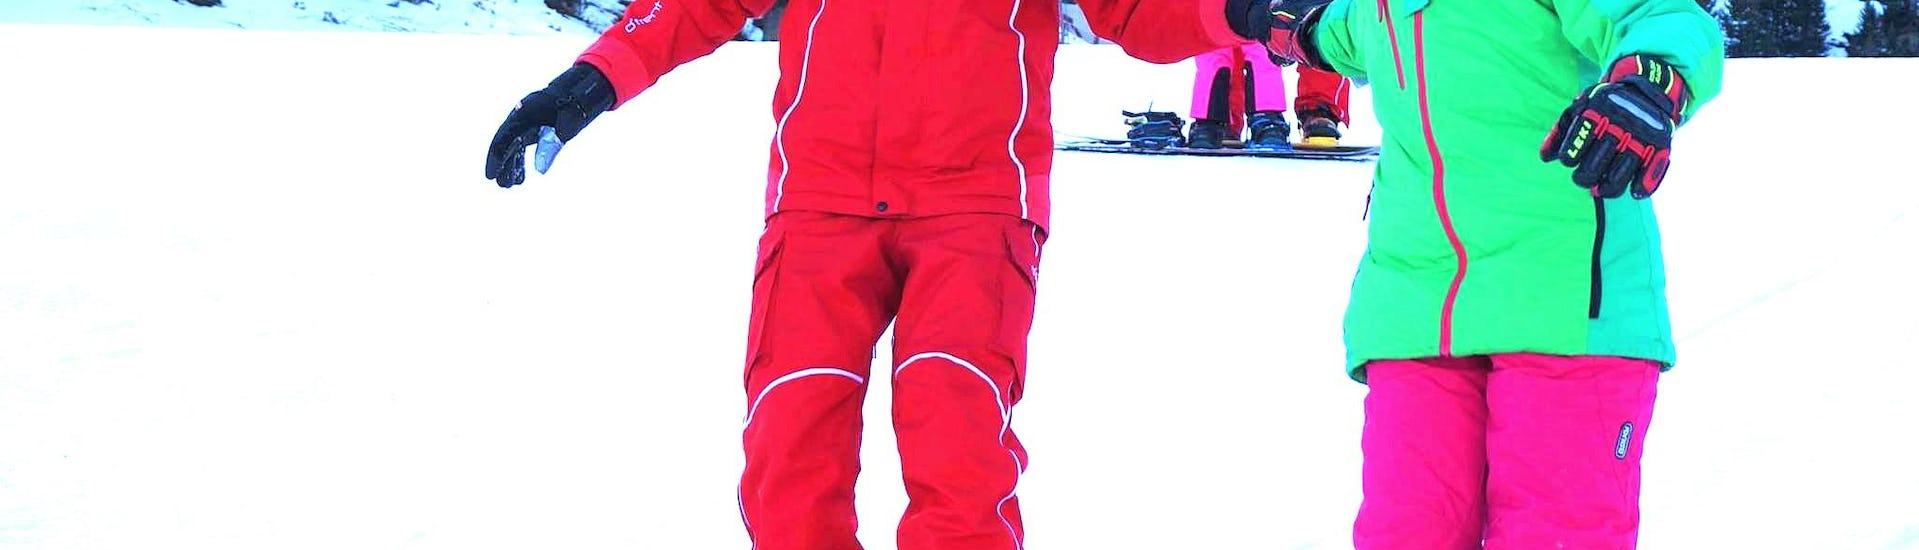 Snowboardkurs für Kinder (6-15 J.) - Junior Club